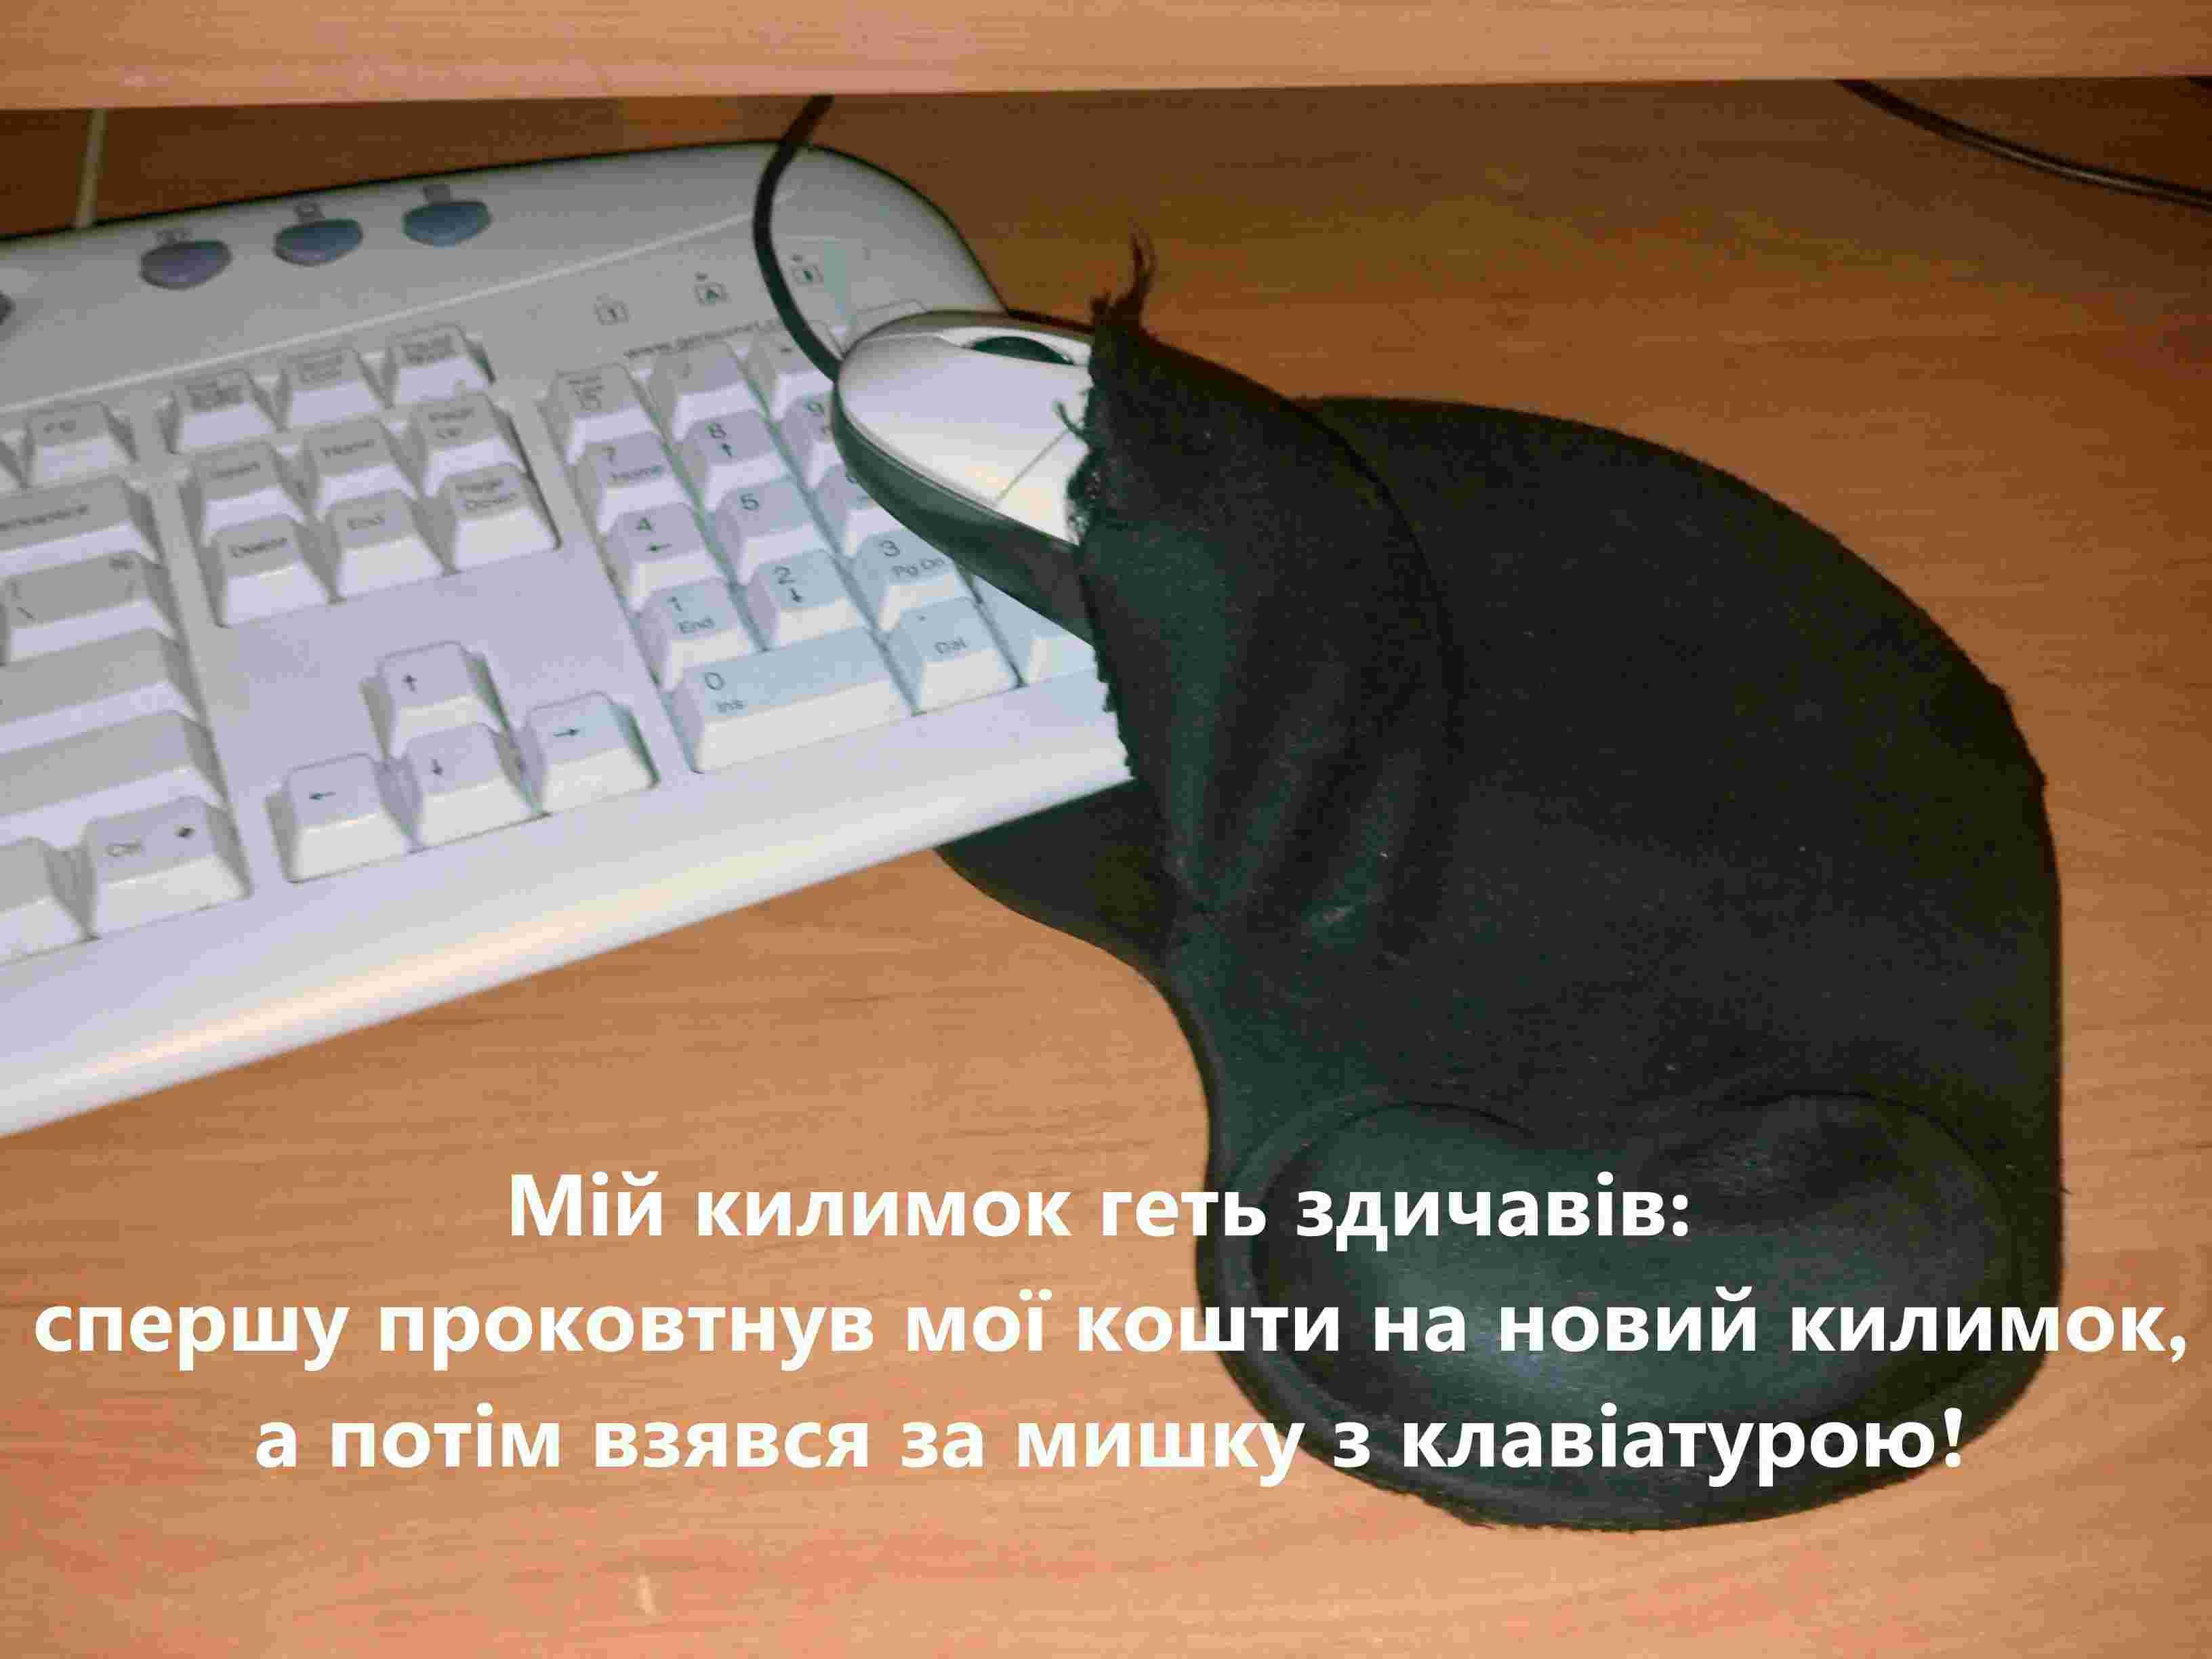 11 Кирилл Данилов kirilldanilov16@gmail.com